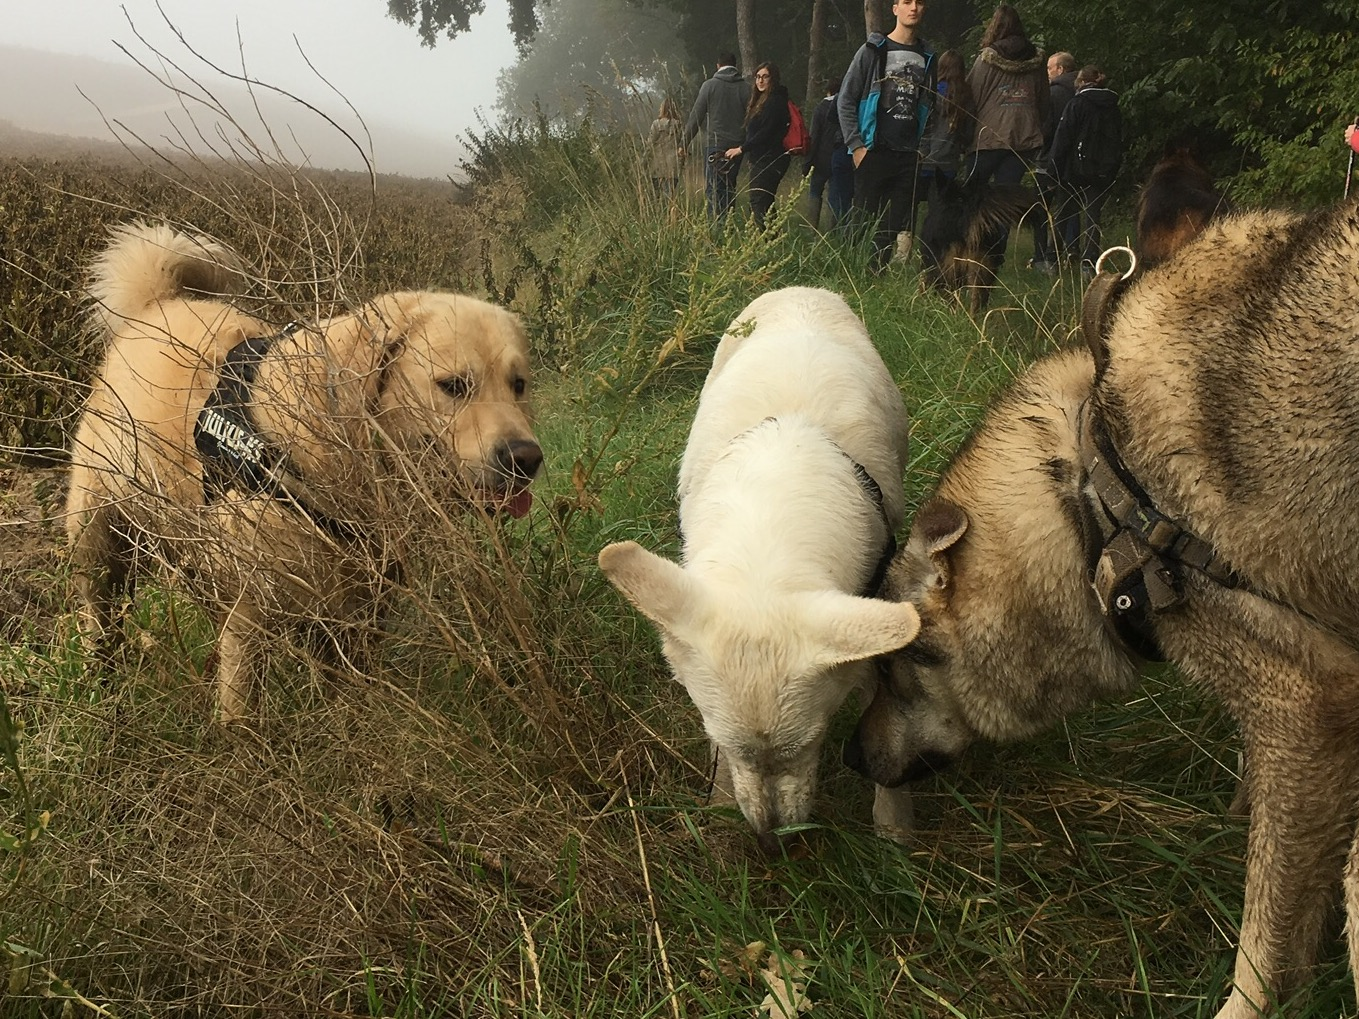 Golden retriever regardant un berger blanc interagissant avec un chien loup